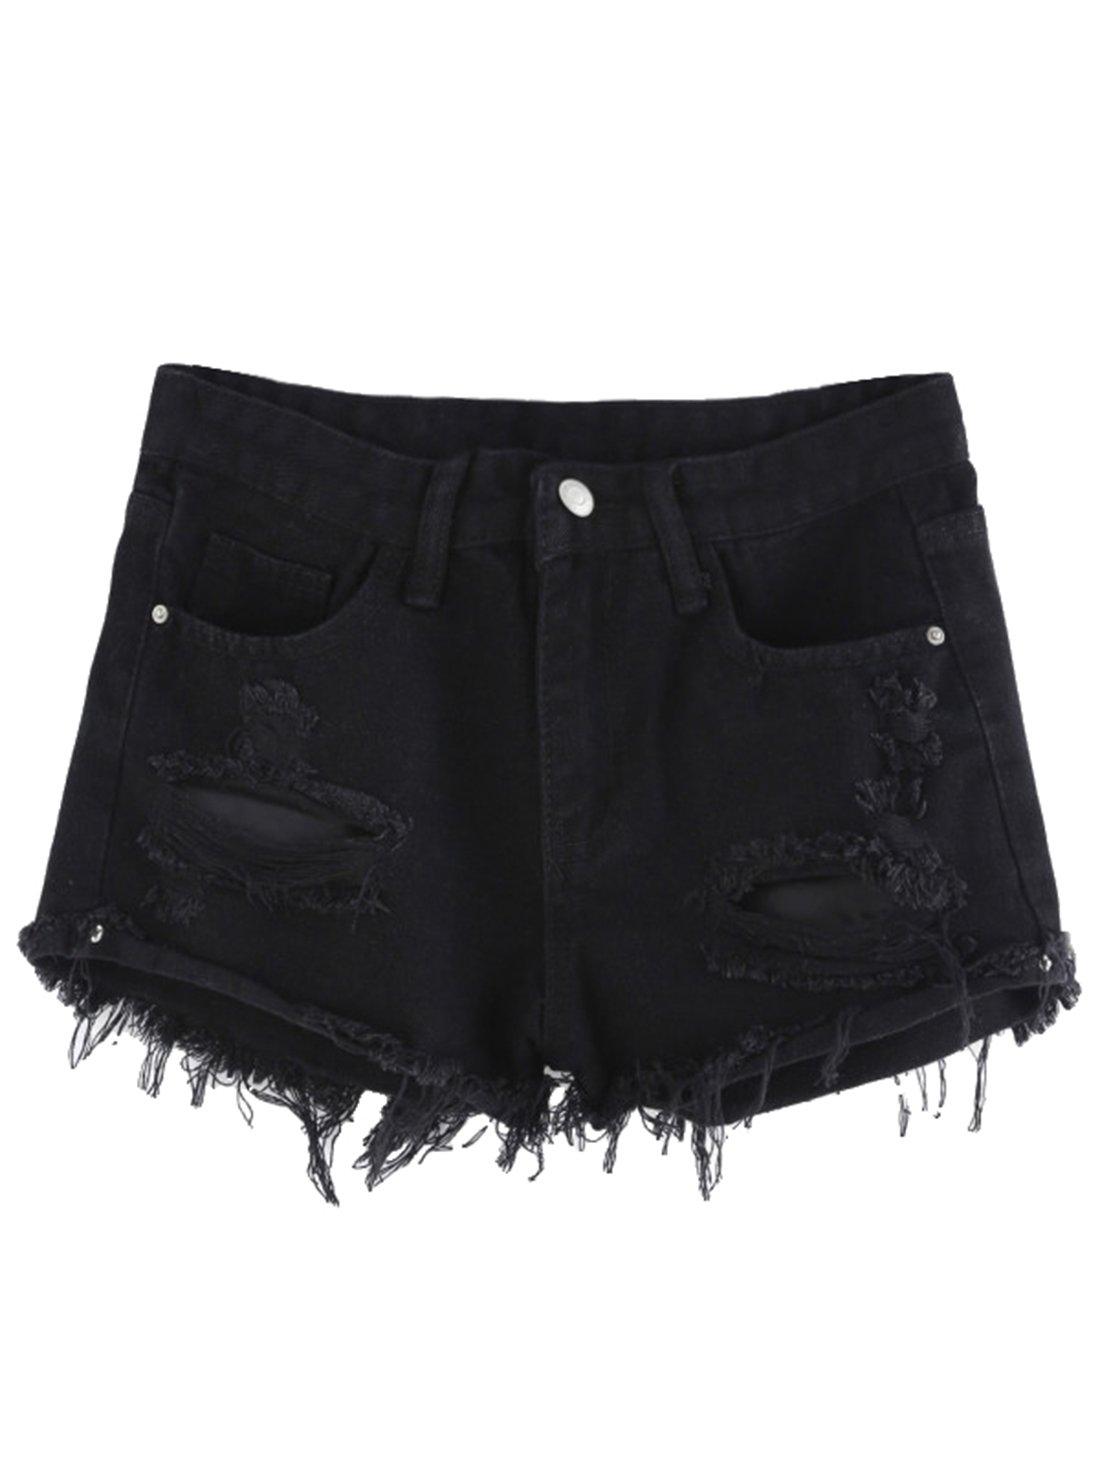 MakeMeChic Women's Frayed Raw Hem Ripped Distressed Denim Shorts Black# S